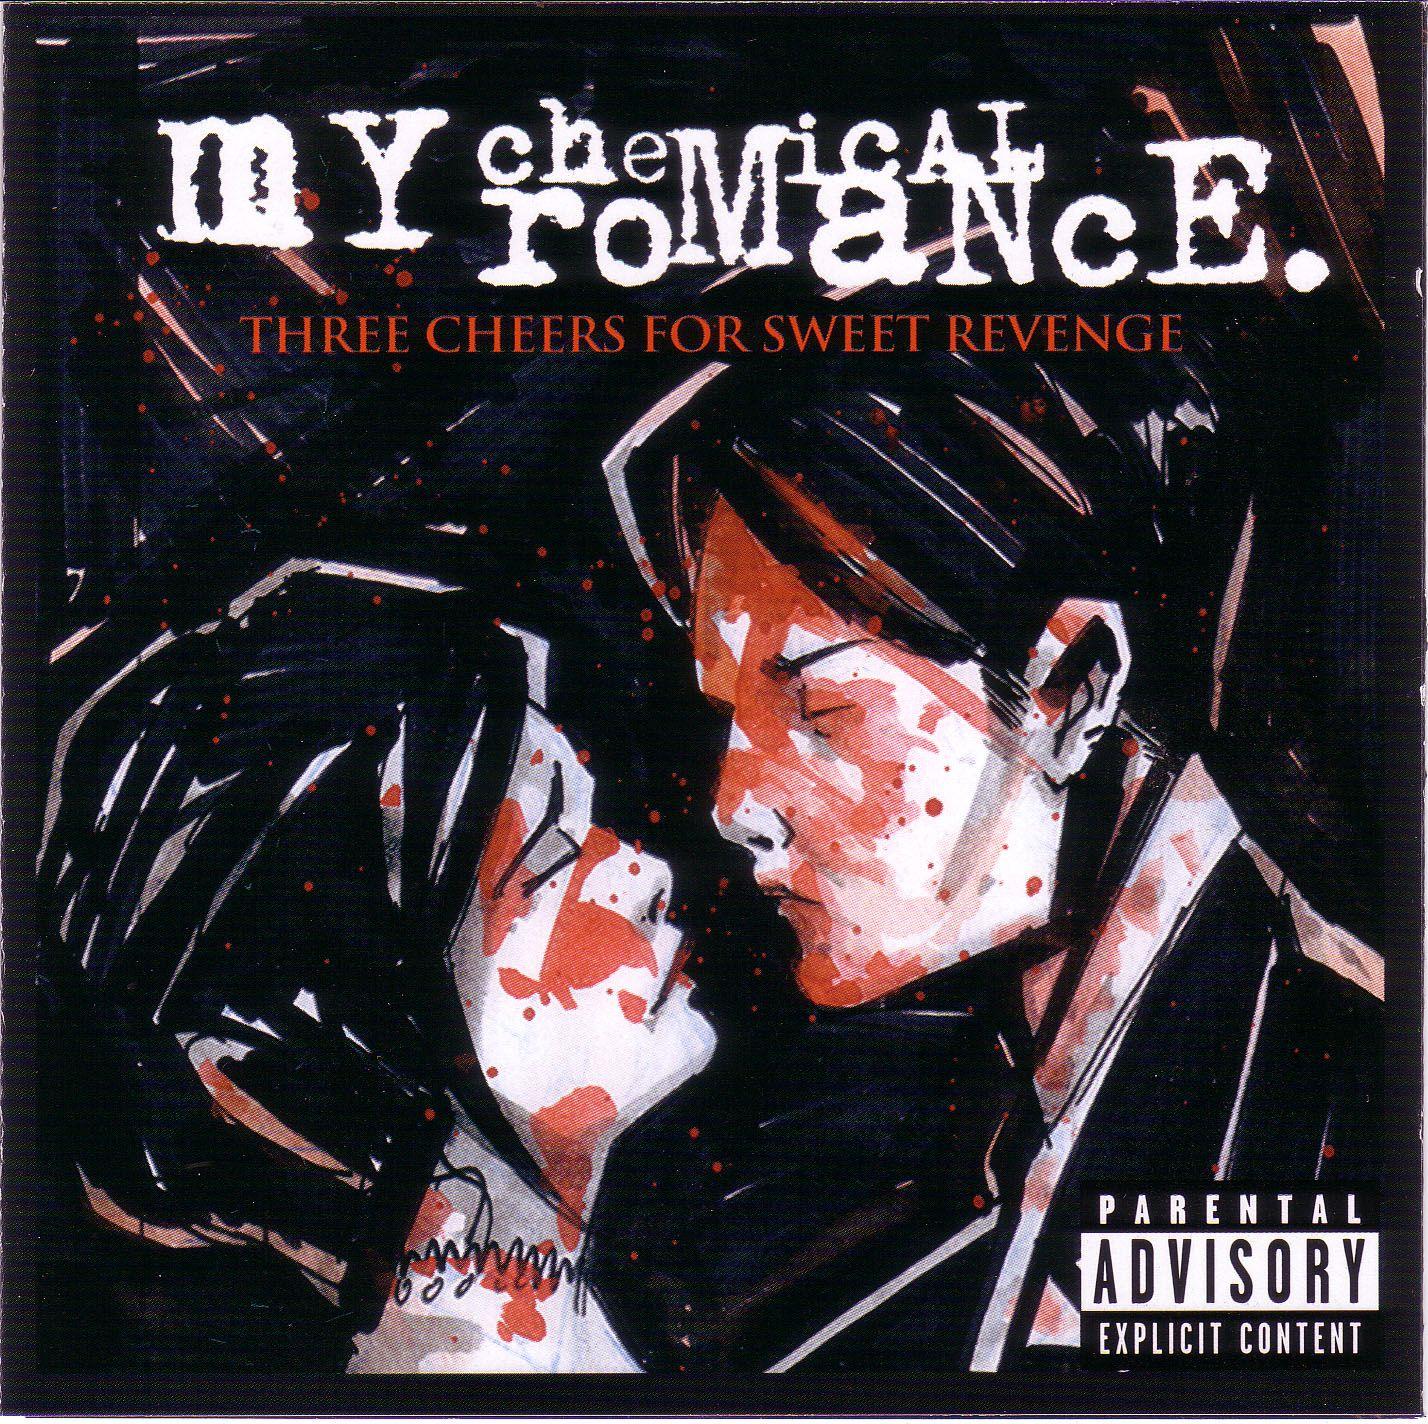 My Chemical Romance - Three Cheers For Sweet Revenge album cover